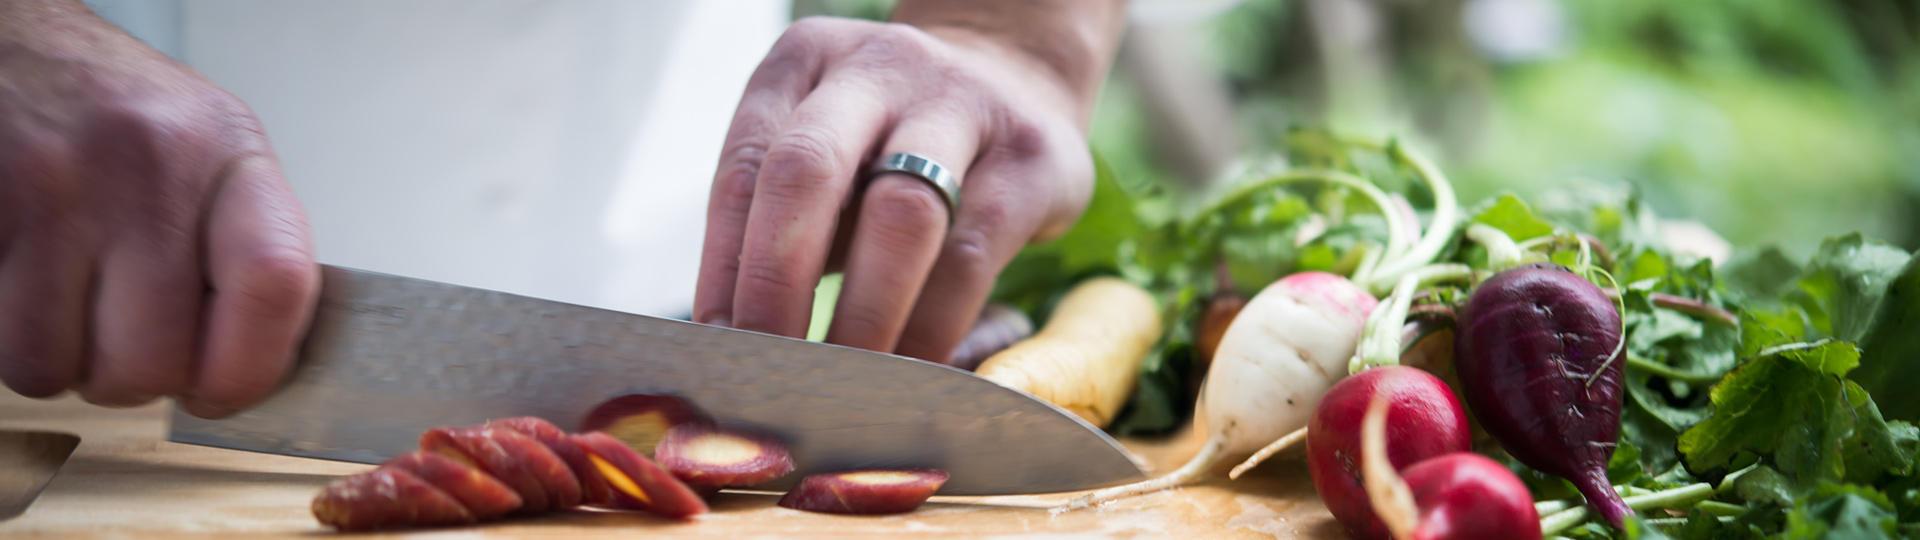 knife chopping a carrot